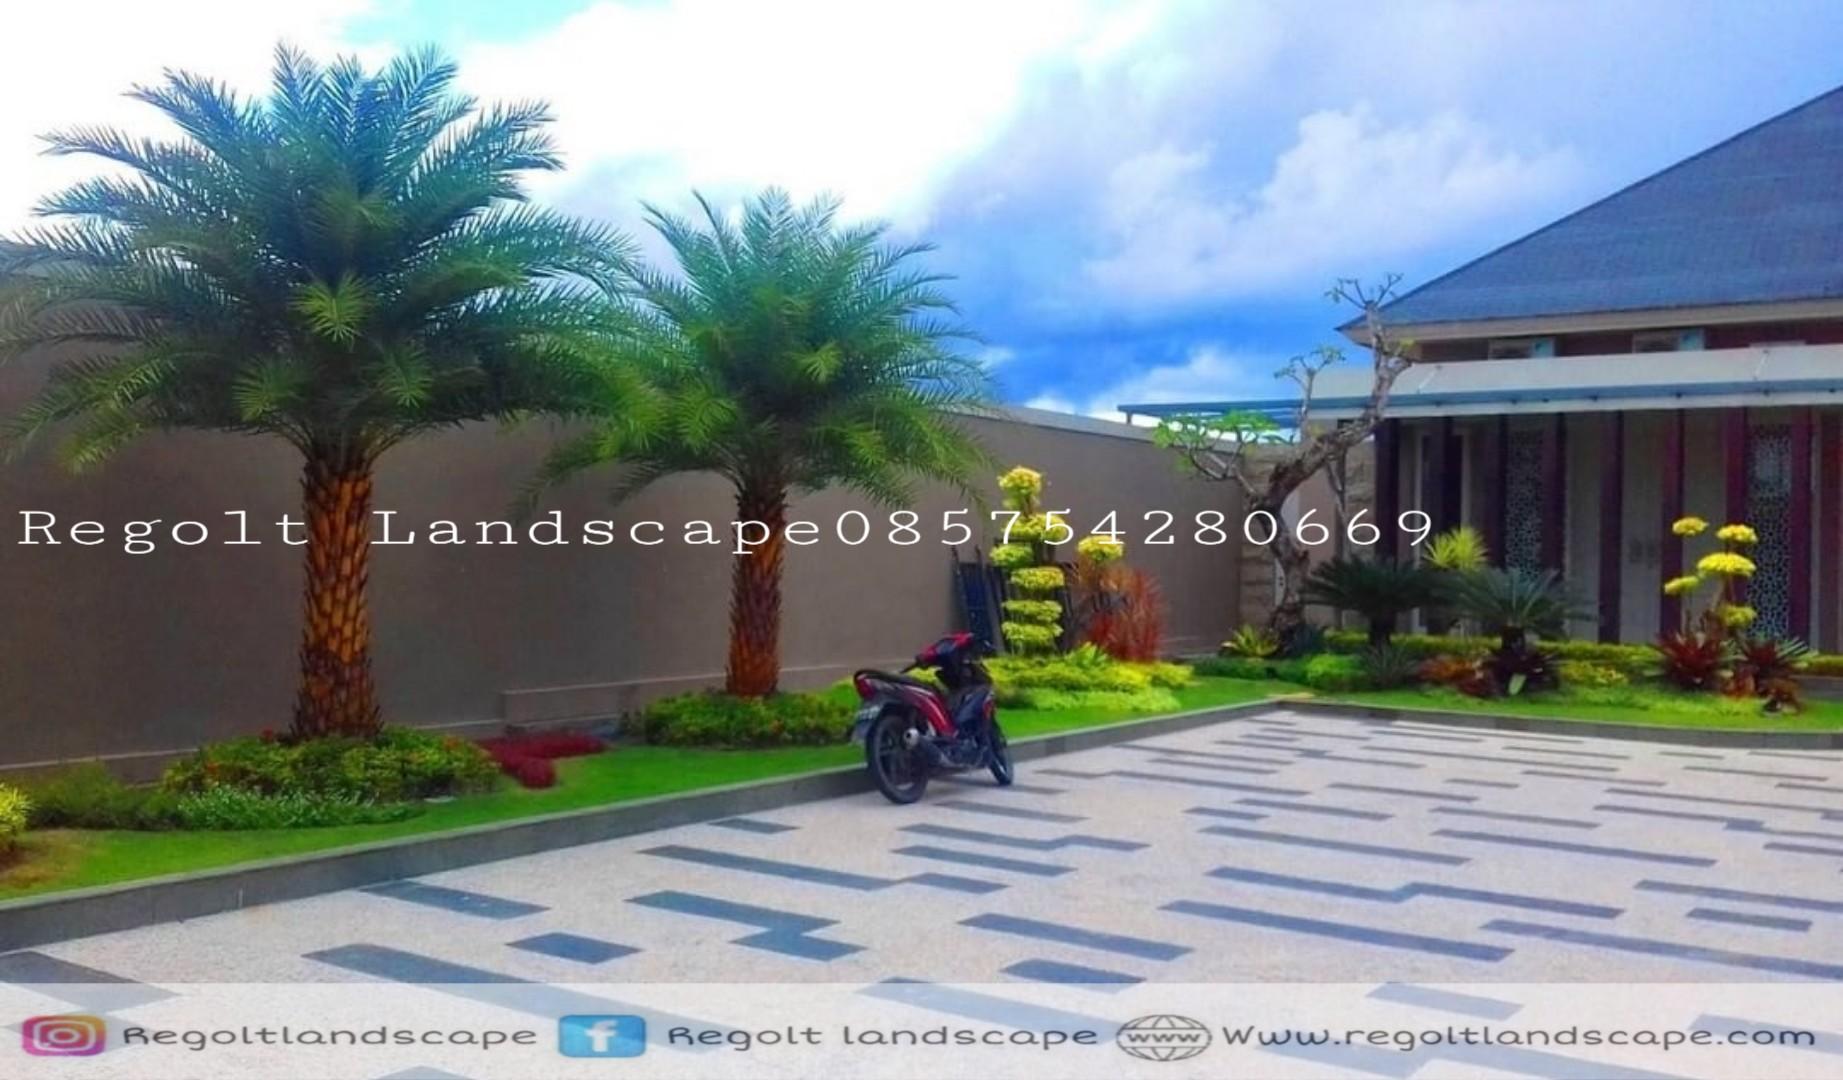 Jasa Pembuatan Taman Di Tulungagung, Blitar, Nganjuk, Pacitan